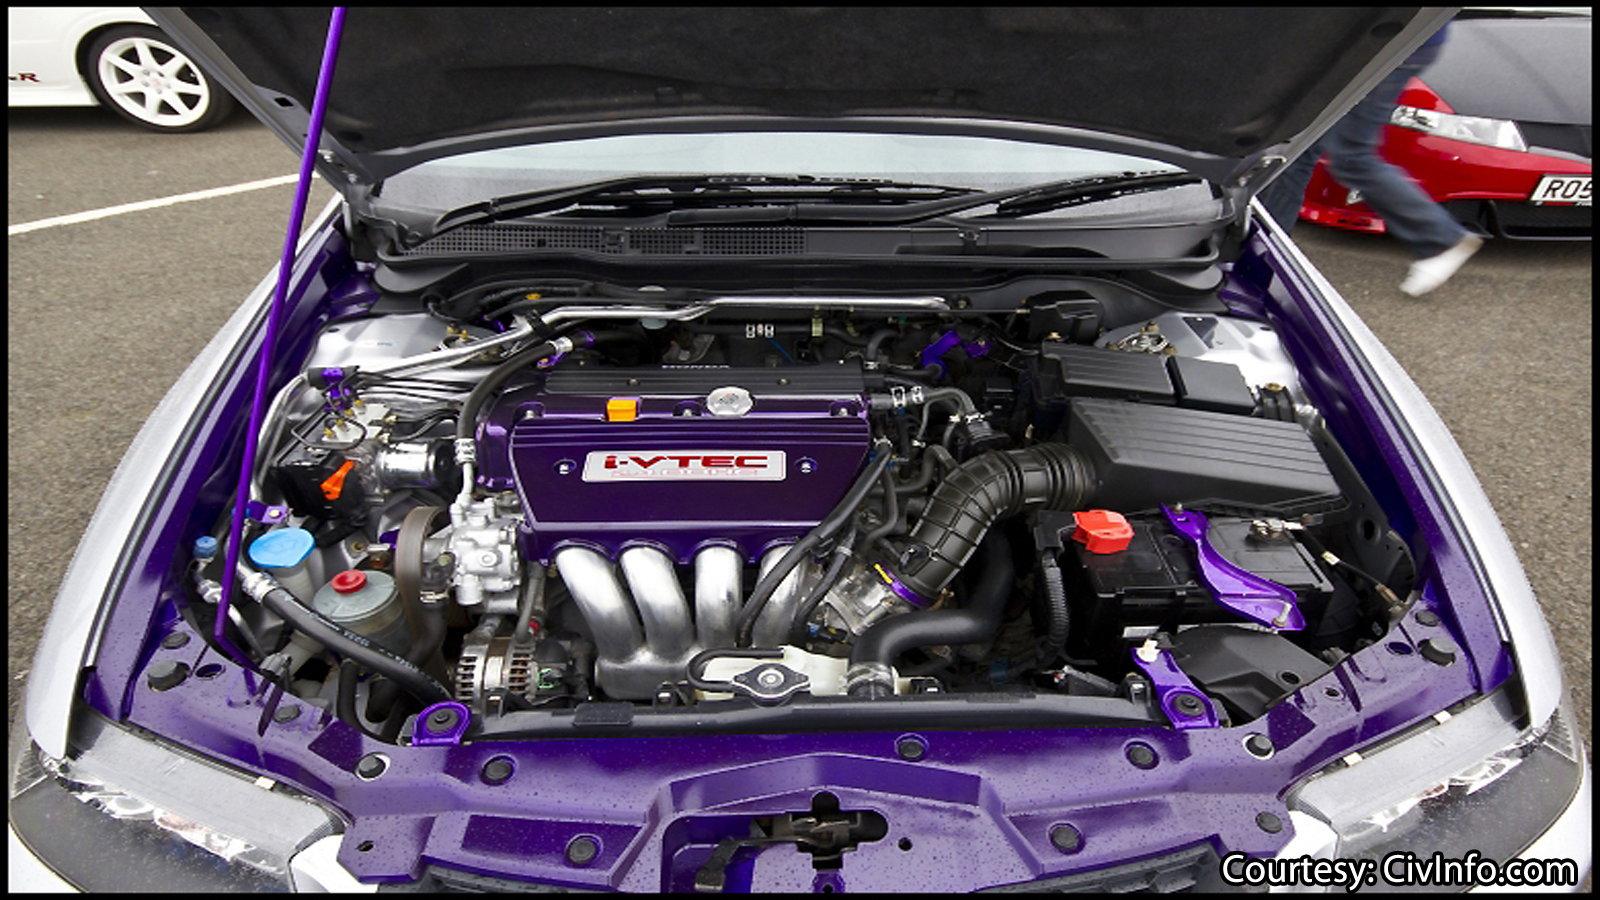 2. Engine Bay